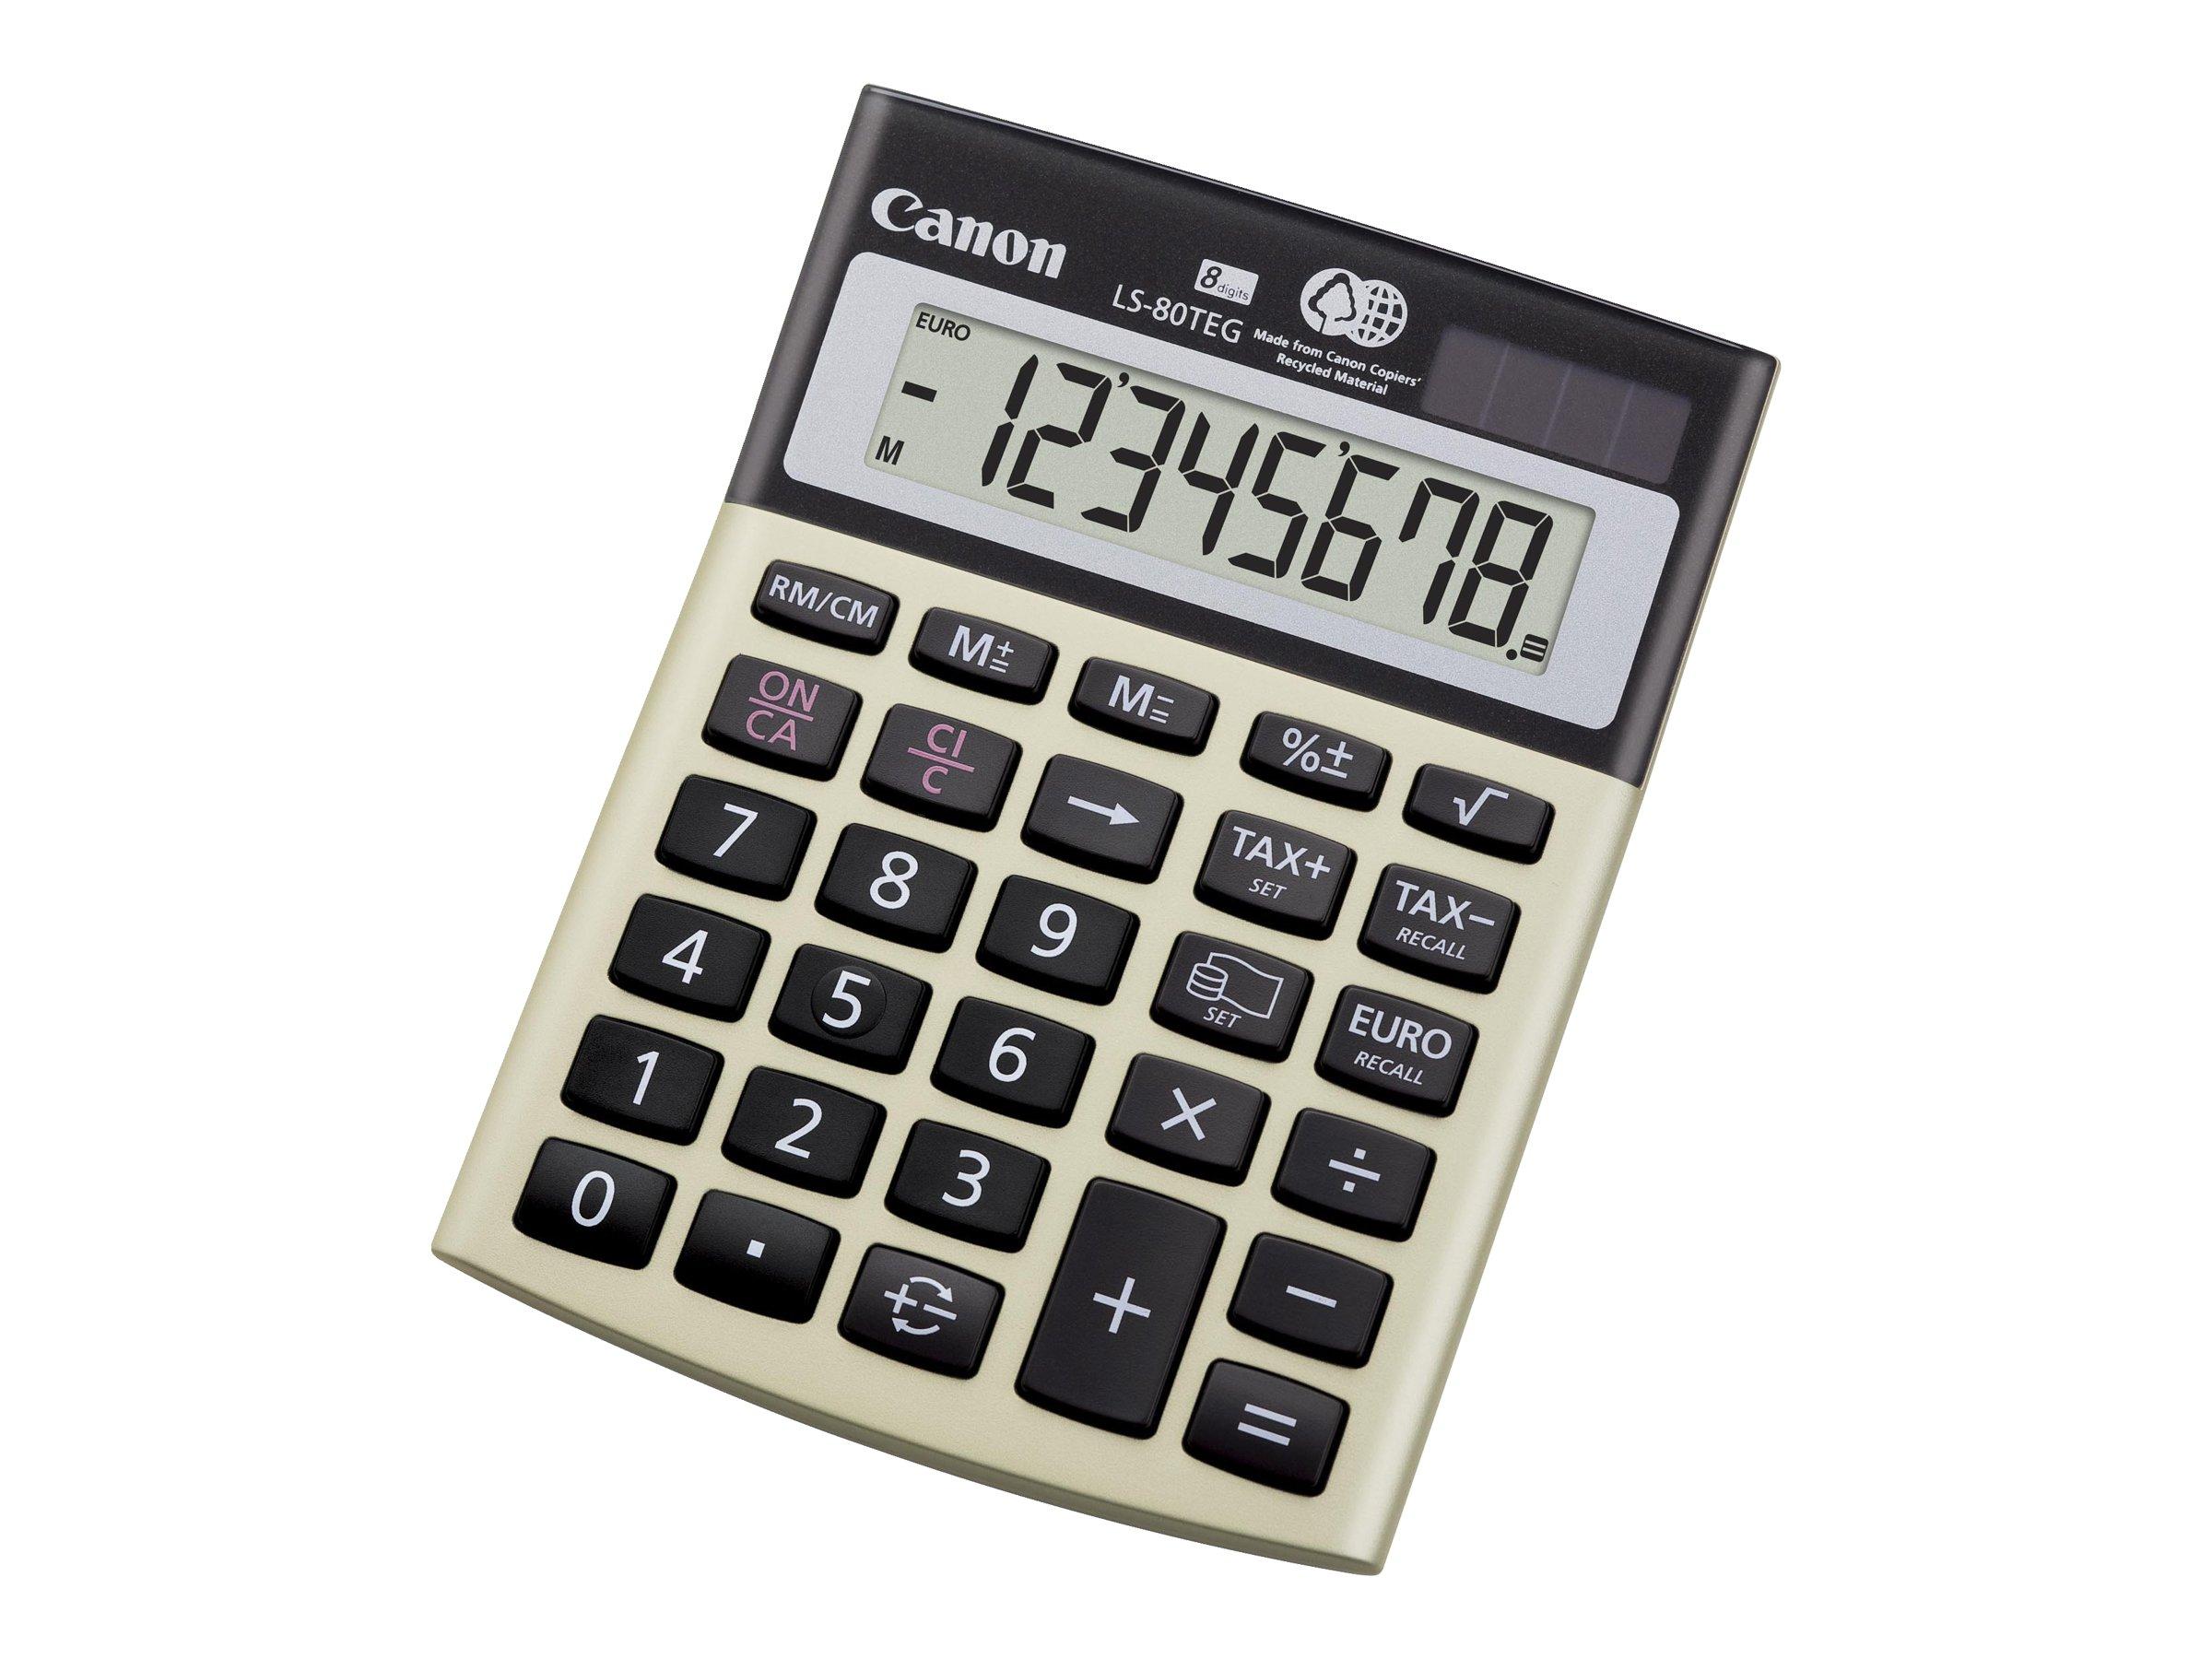 Canon LS-80TEG - Desktop-Taschenrechner - 8 Stellen - Solarpanel, Batterie - Silver Metallic